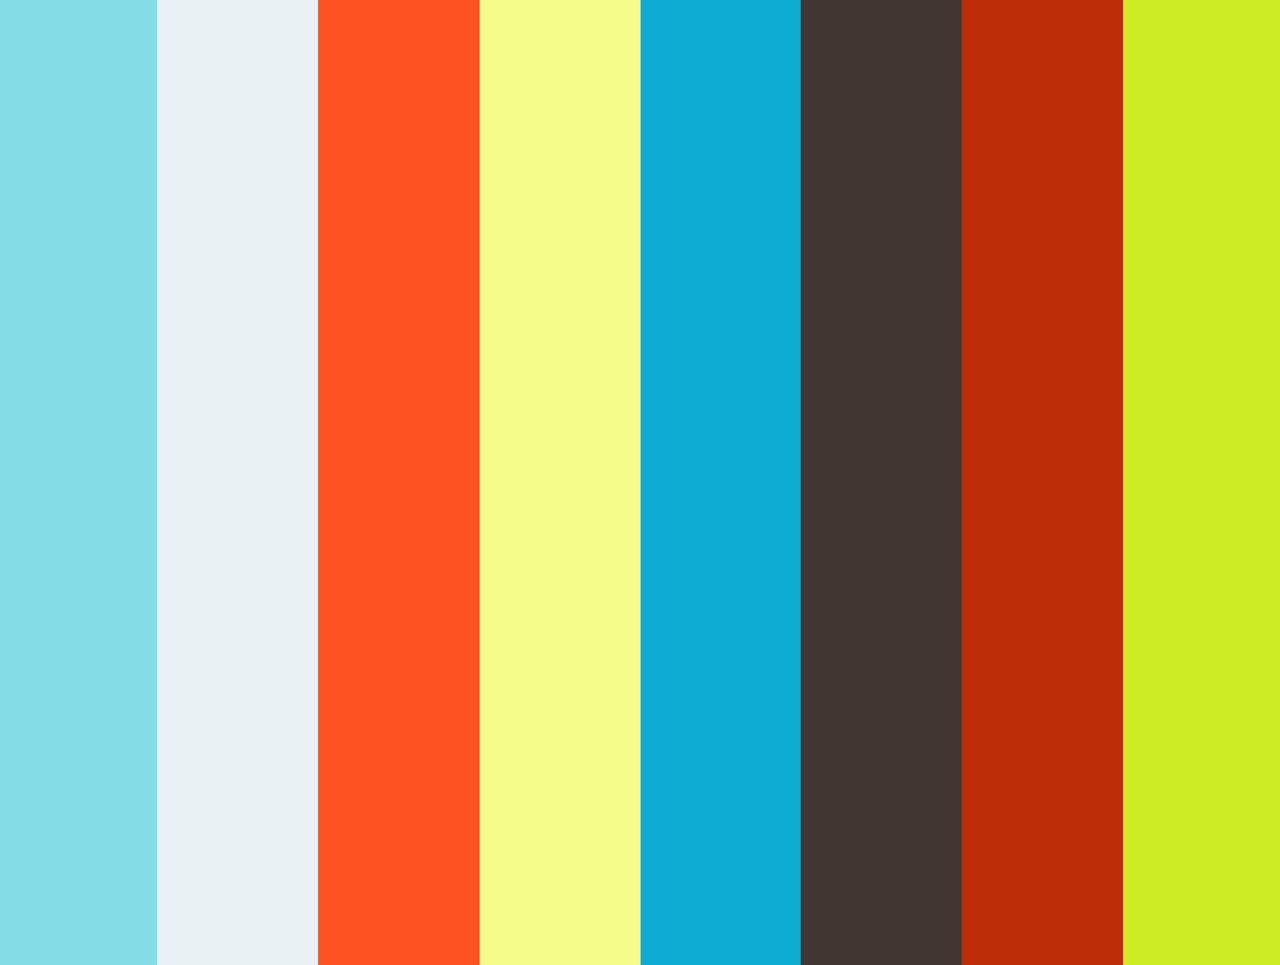 christian svanes kolding, production designer, showreel for cecilie | 4 min.